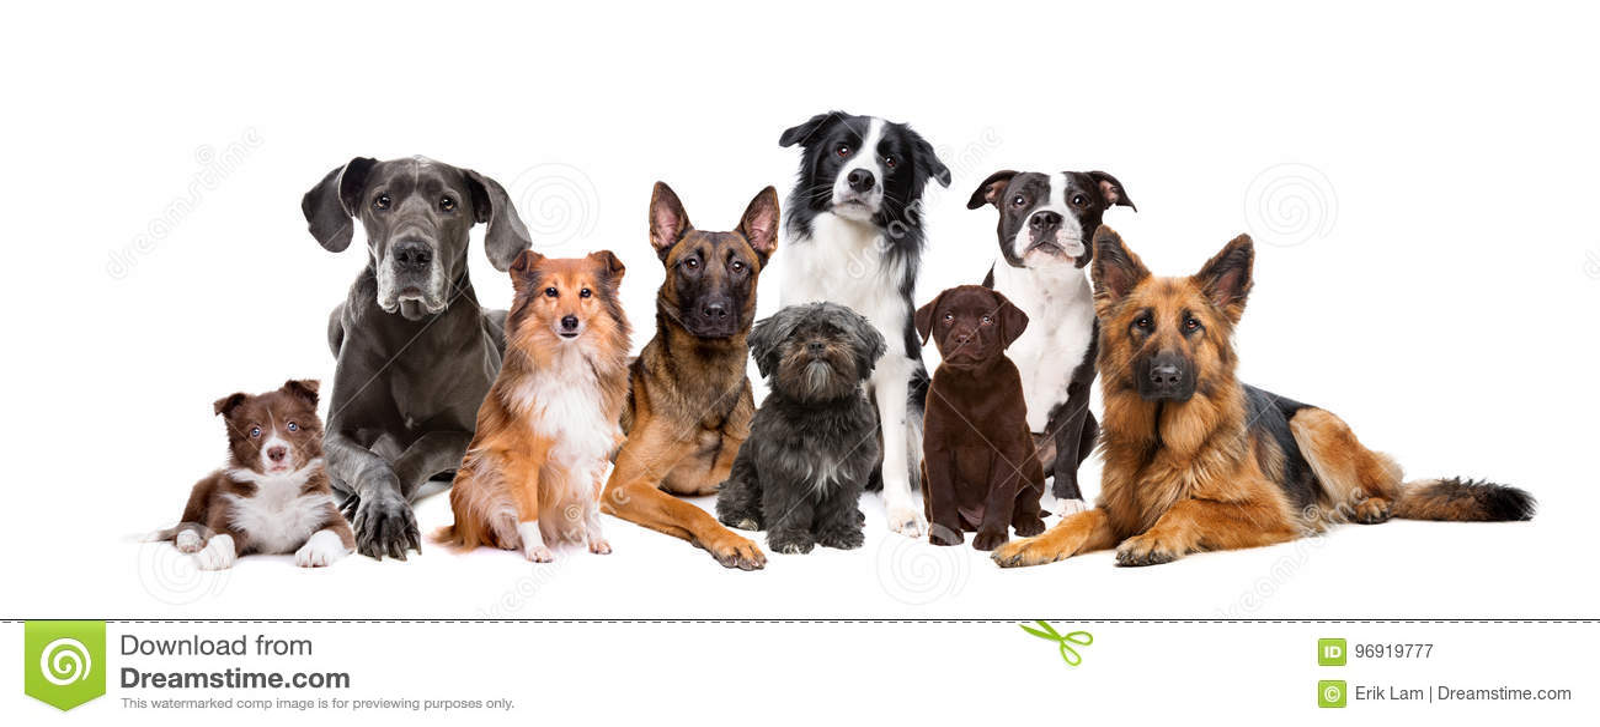 Gruppe von neun Hunden